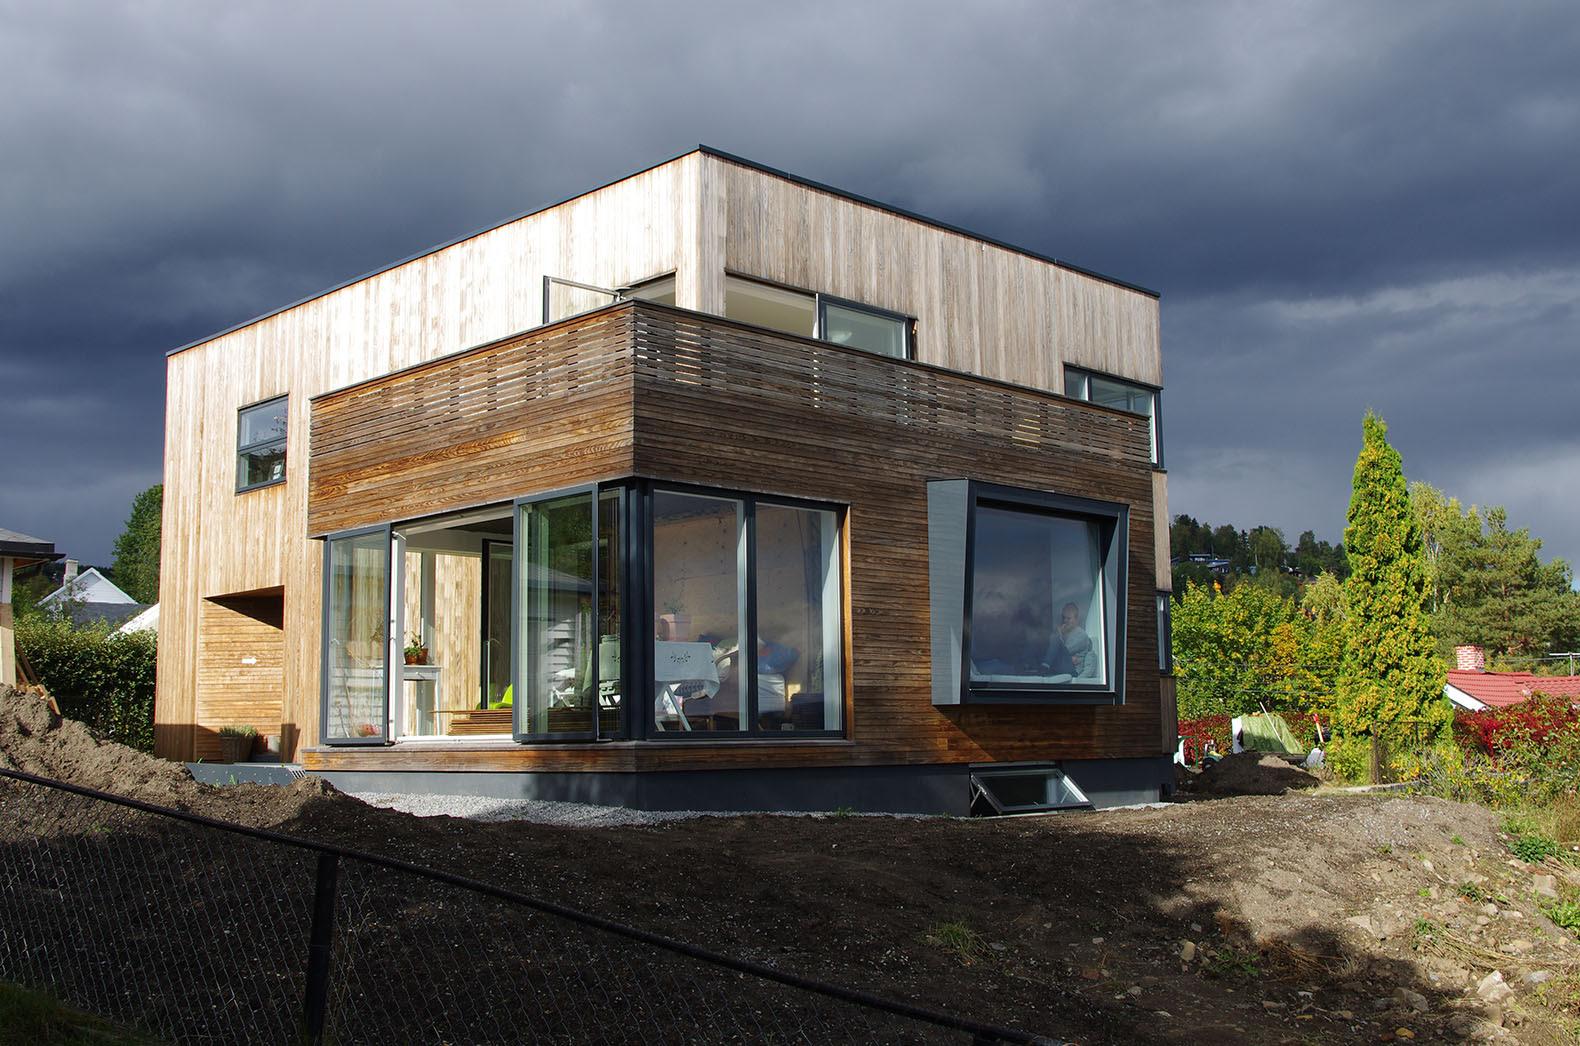 Best House Design Of The Year | Modern Design